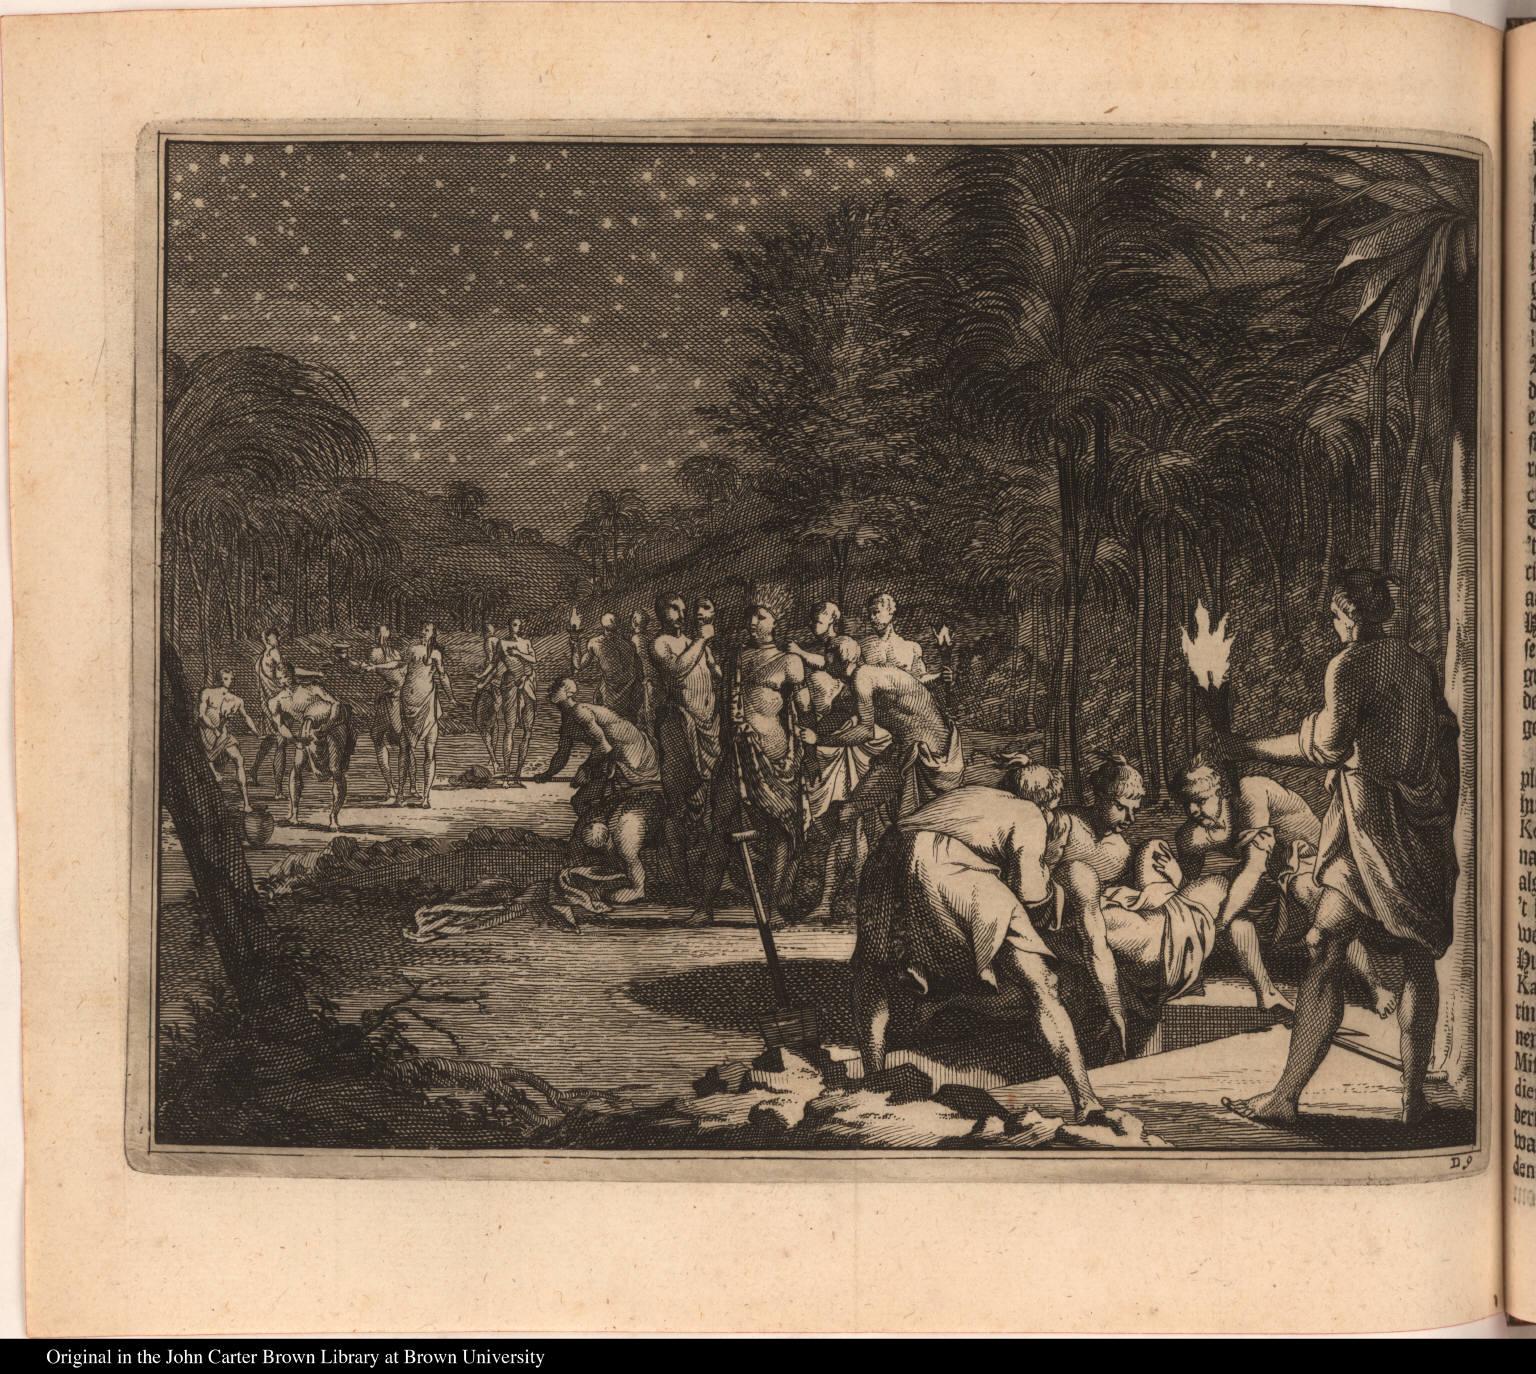 [Native American burial]